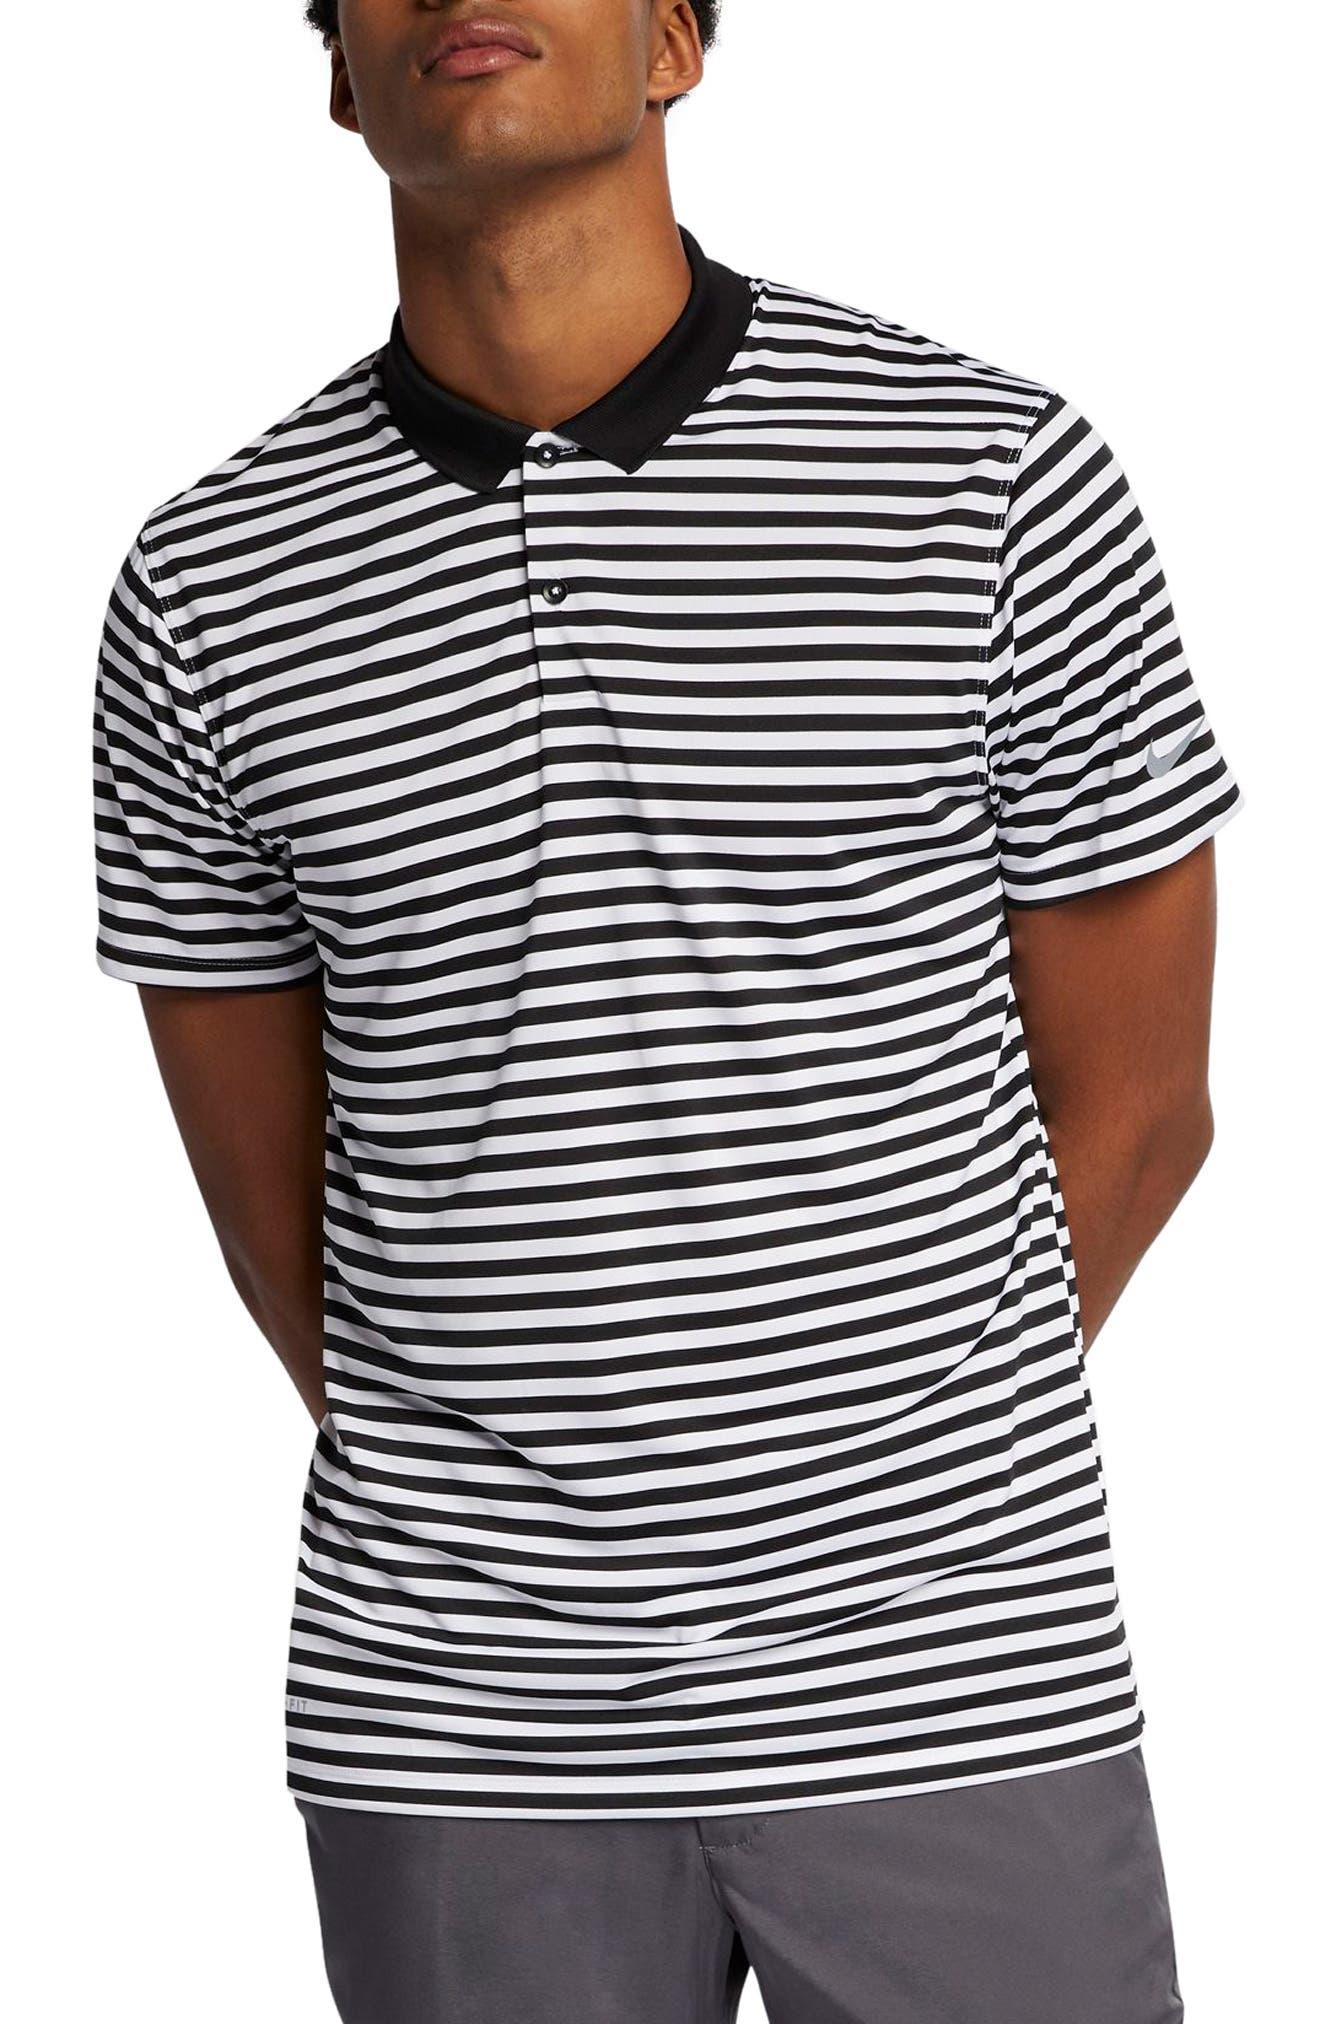 NIKE, Victory Stripe Dri-FIT Golf Polo, Main thumbnail 1, color, BLACK/ WHITE/COOL GREY